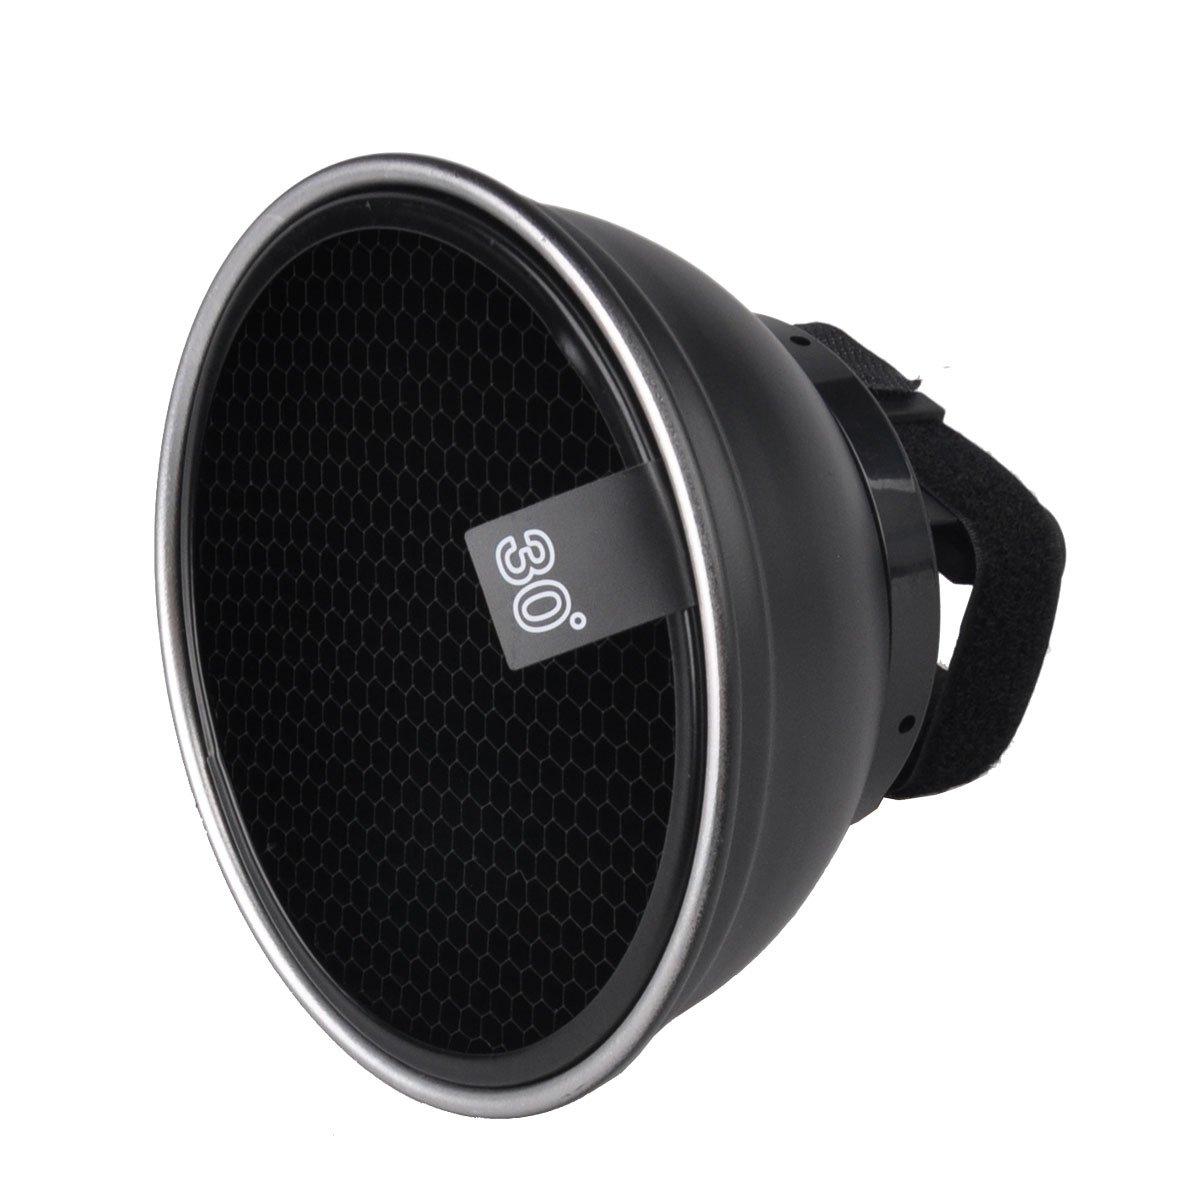 GTX Studio Speedlight Reflector by GTX Studio